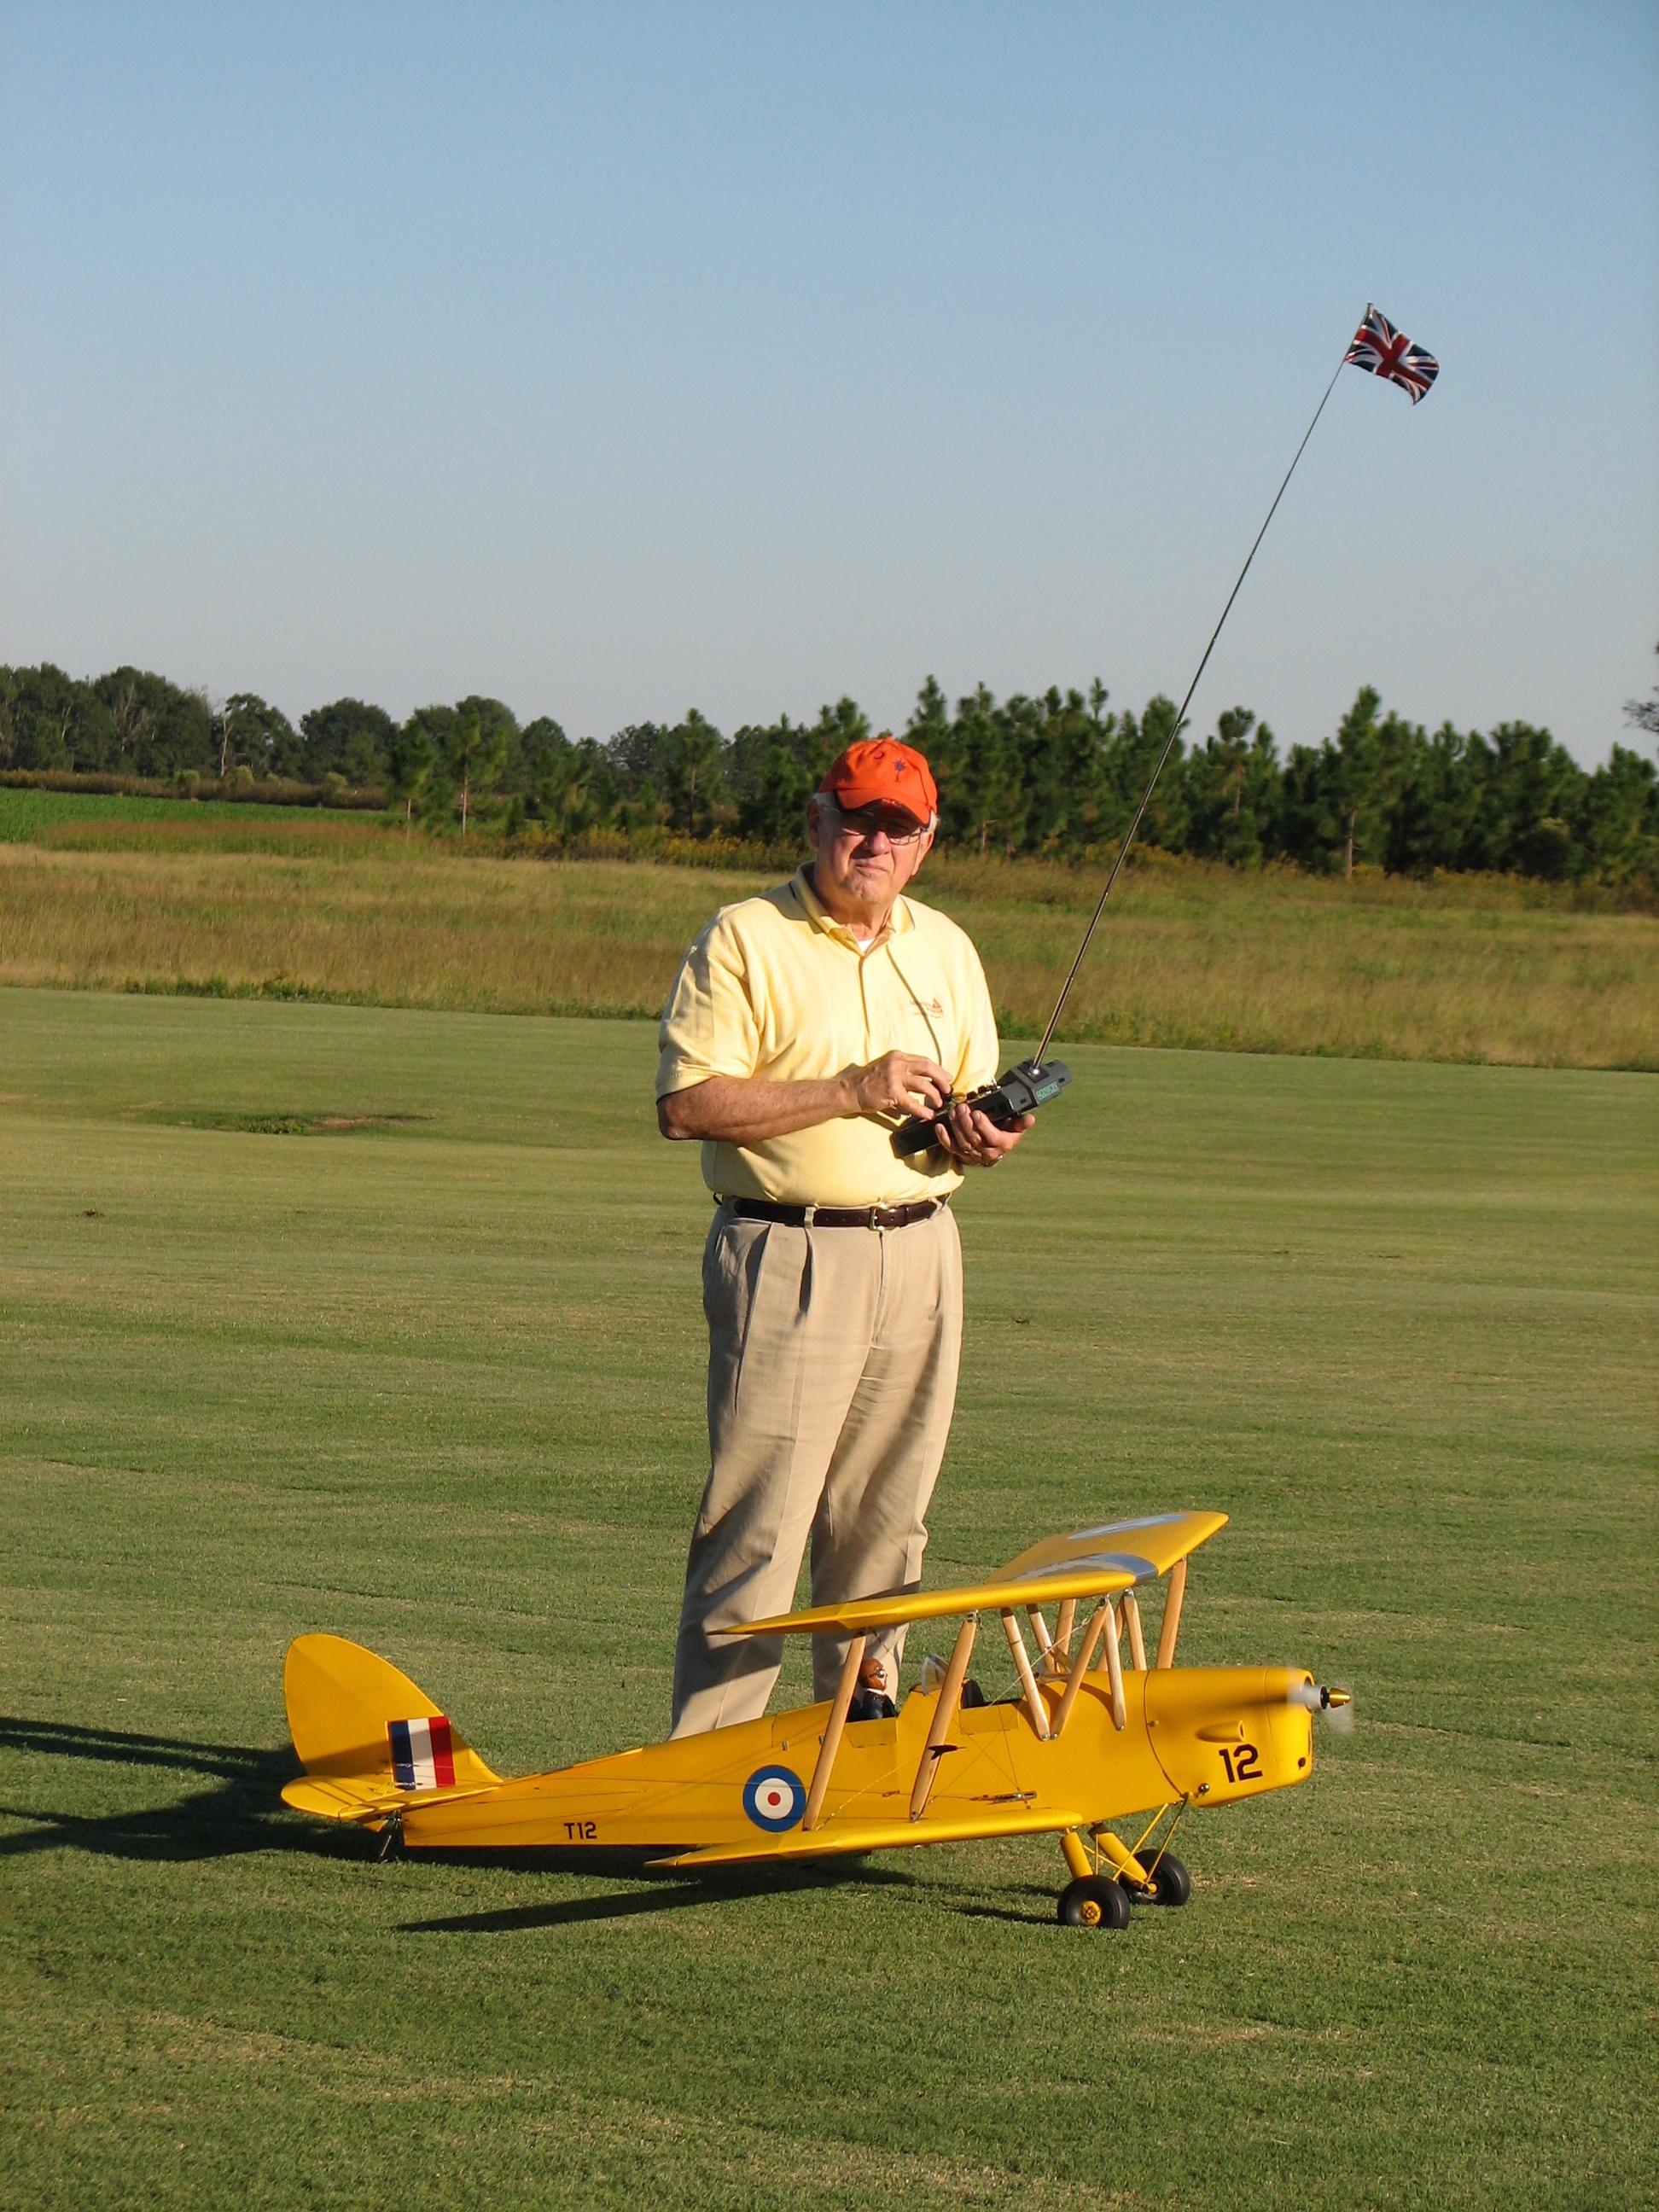 Click image for larger version.  Name:Tiger Moth at Macks.jpg Views:22 Size:2.19 MB ID:2028855